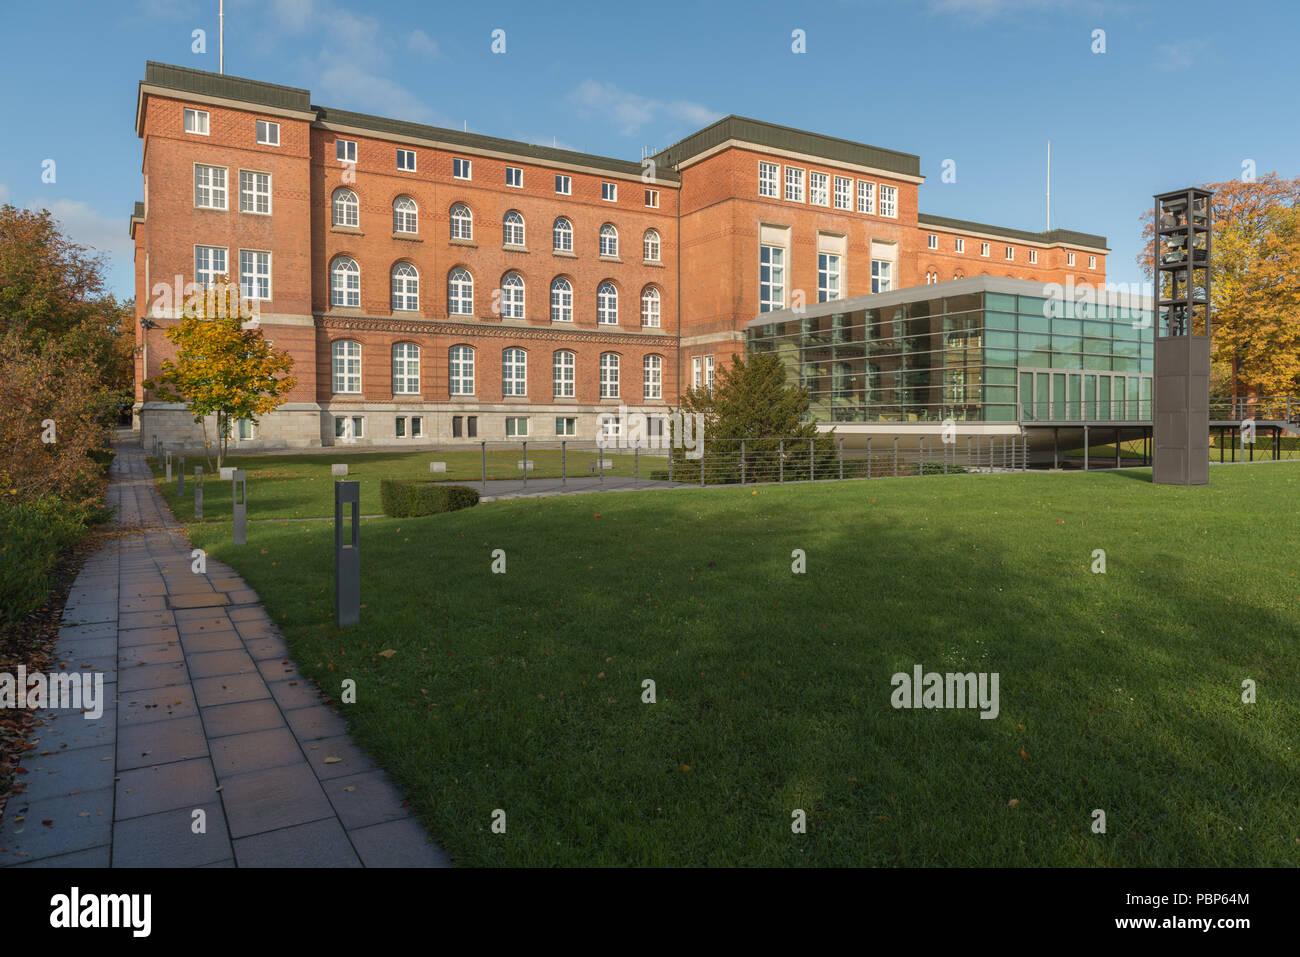 Government building, parliament building, glass construction,  Kiel Fjord, Kiel, capital of Schleswig-Holstein, Germany, Europe - Stock Image